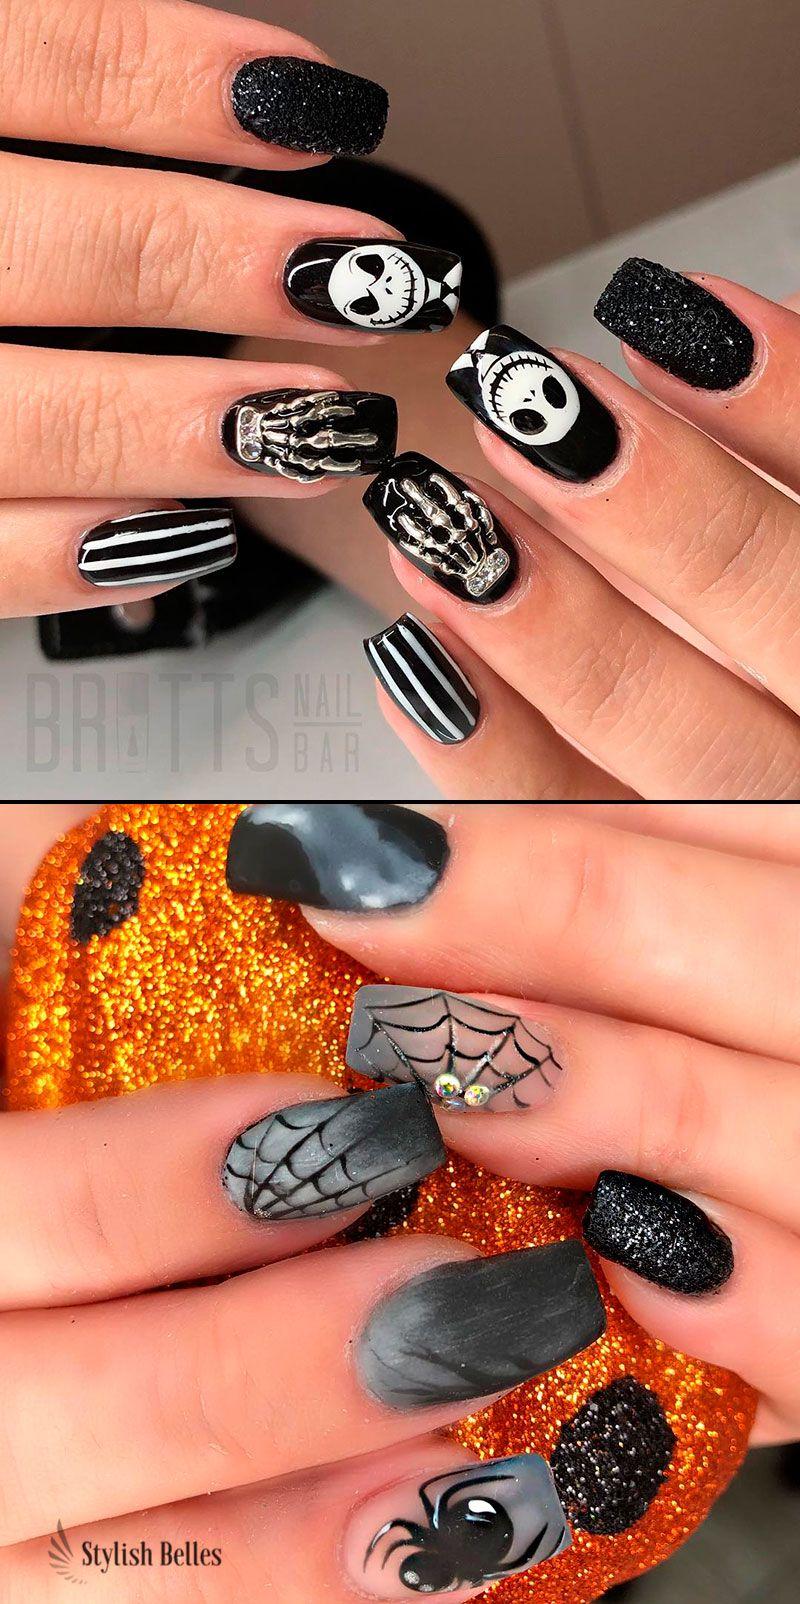 Best Halloween Nail Ideas In 2019 Halloween Nails Easy Easy Halloween Nails Design Nails